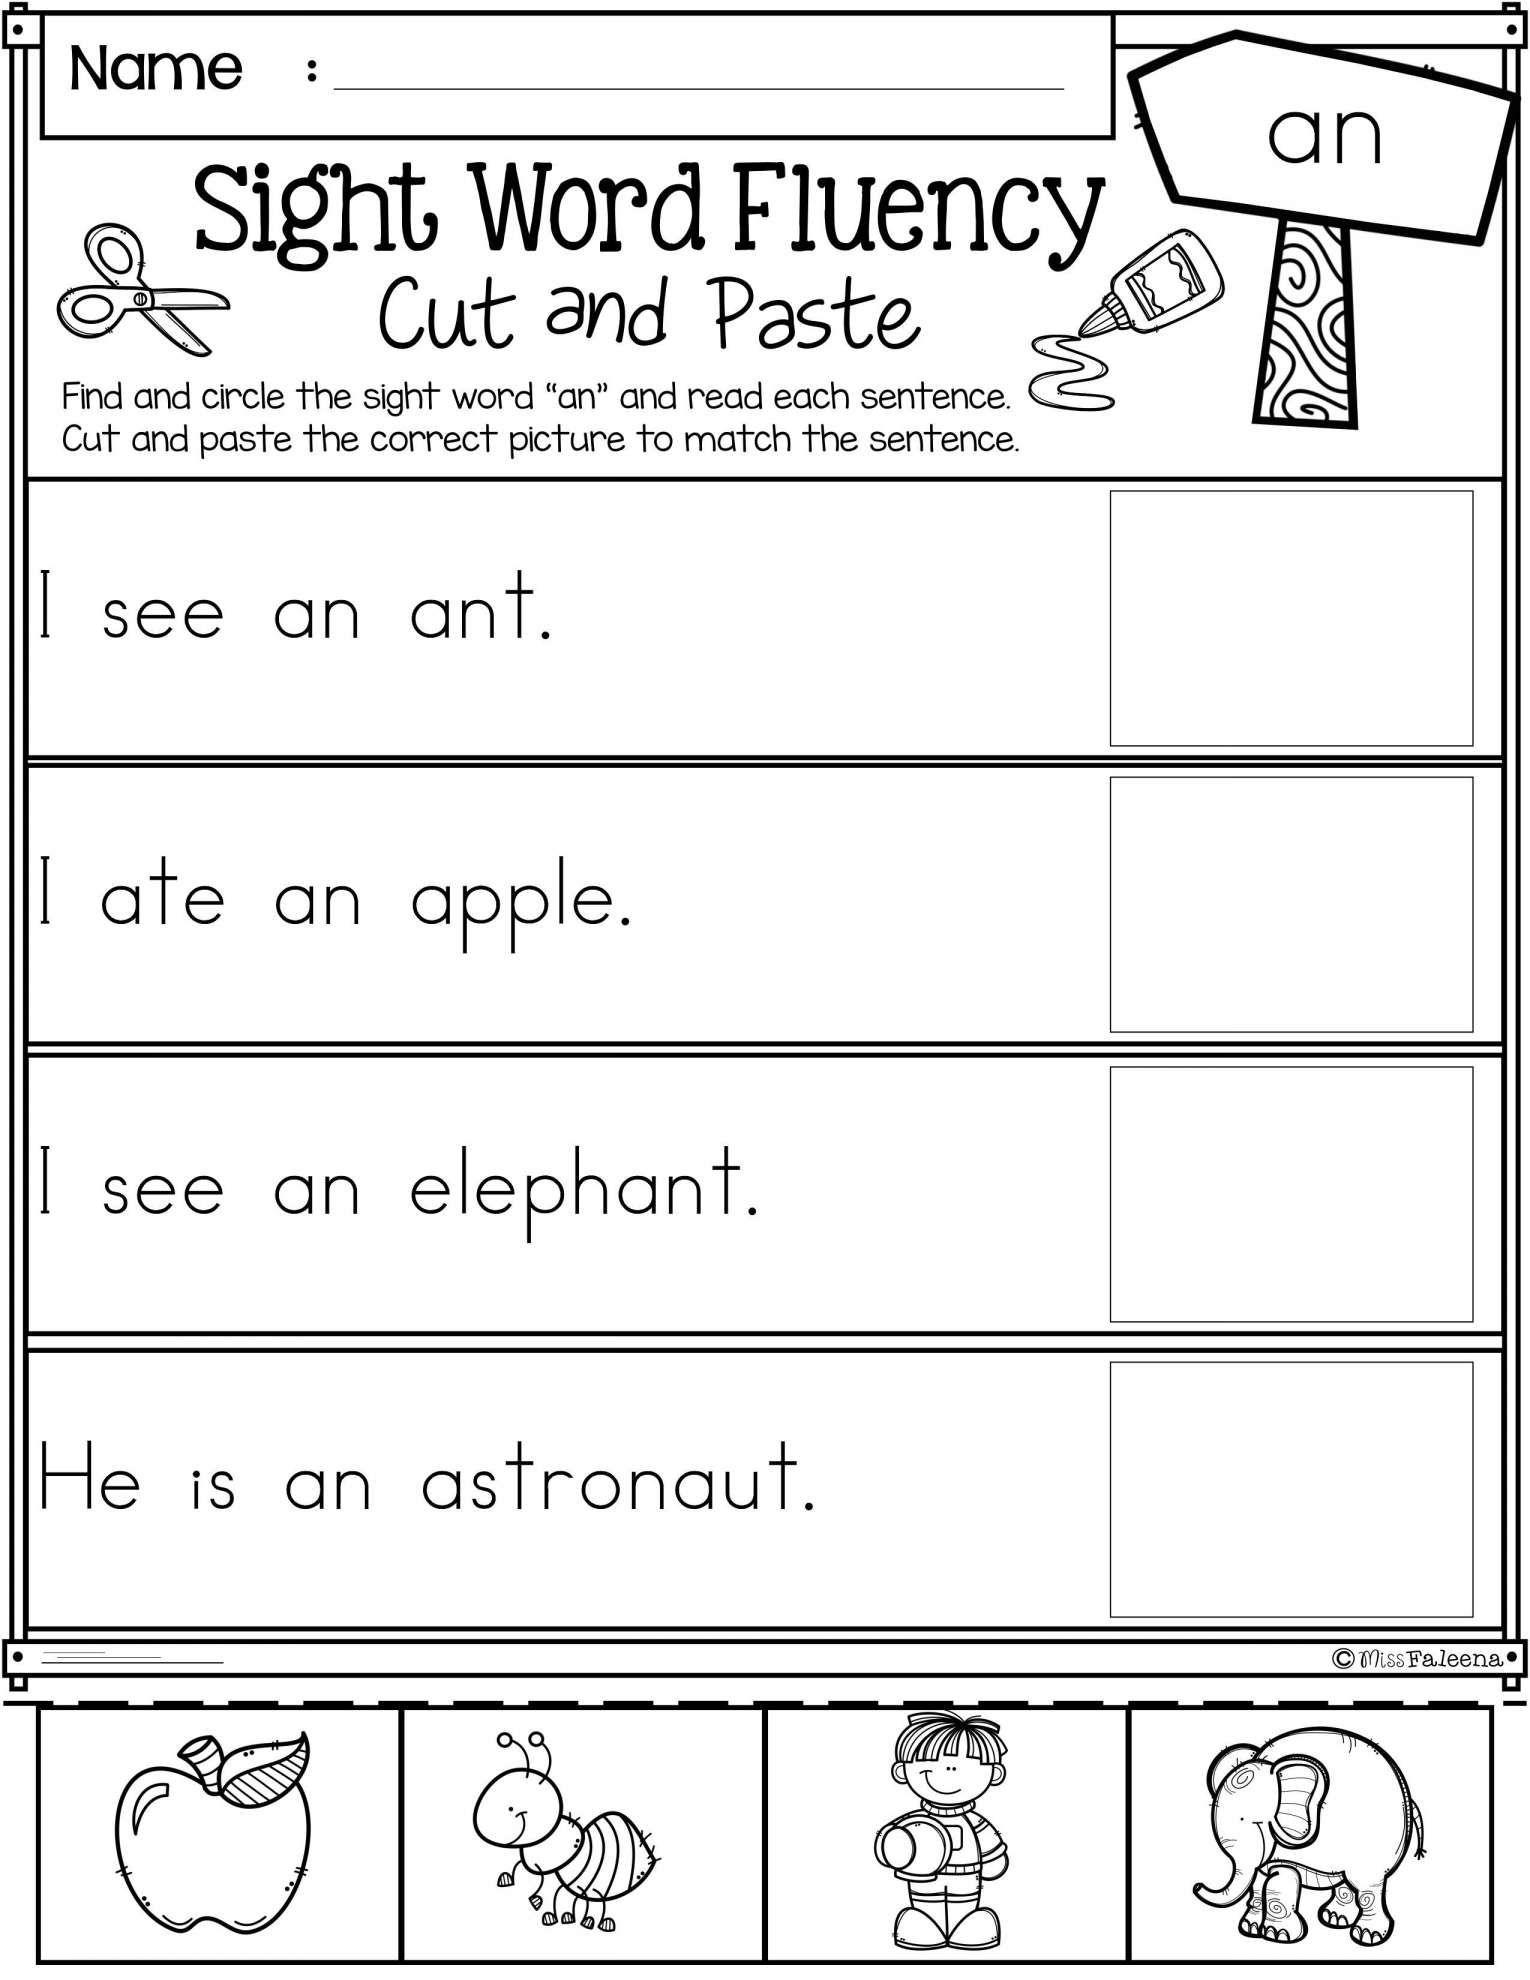 Preschool Worksheet With Short Words And Preschool